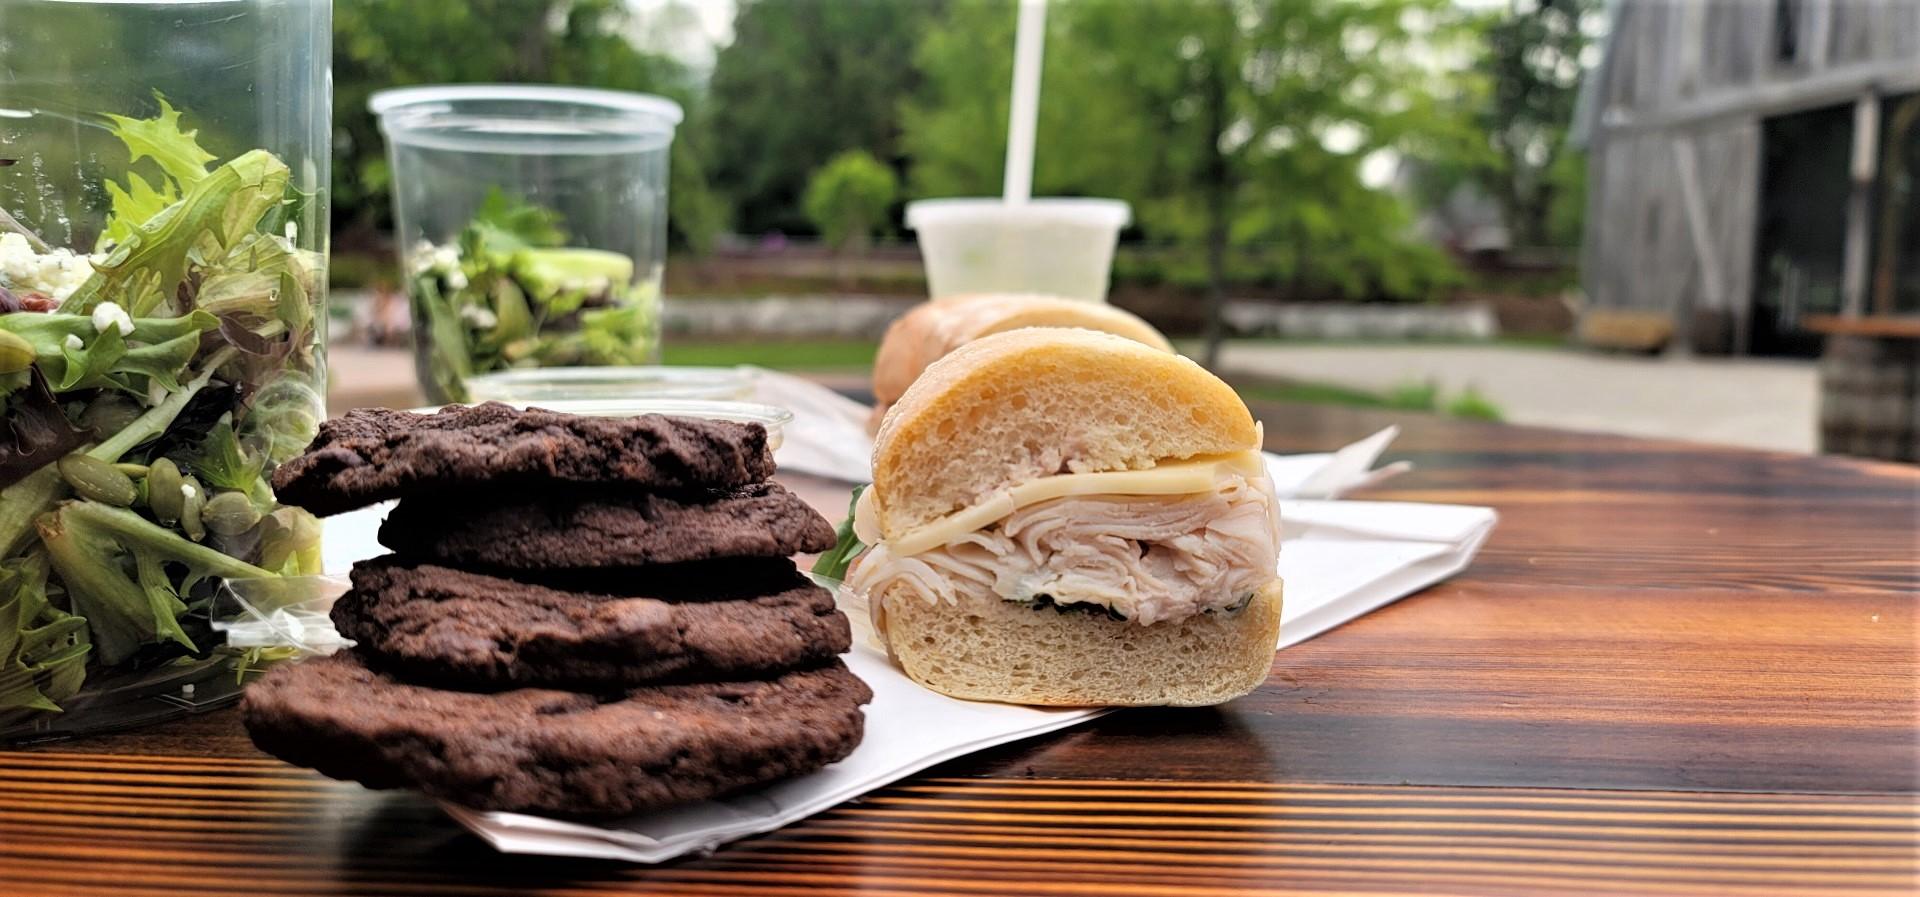 chocolate cookies and turkey sandwich